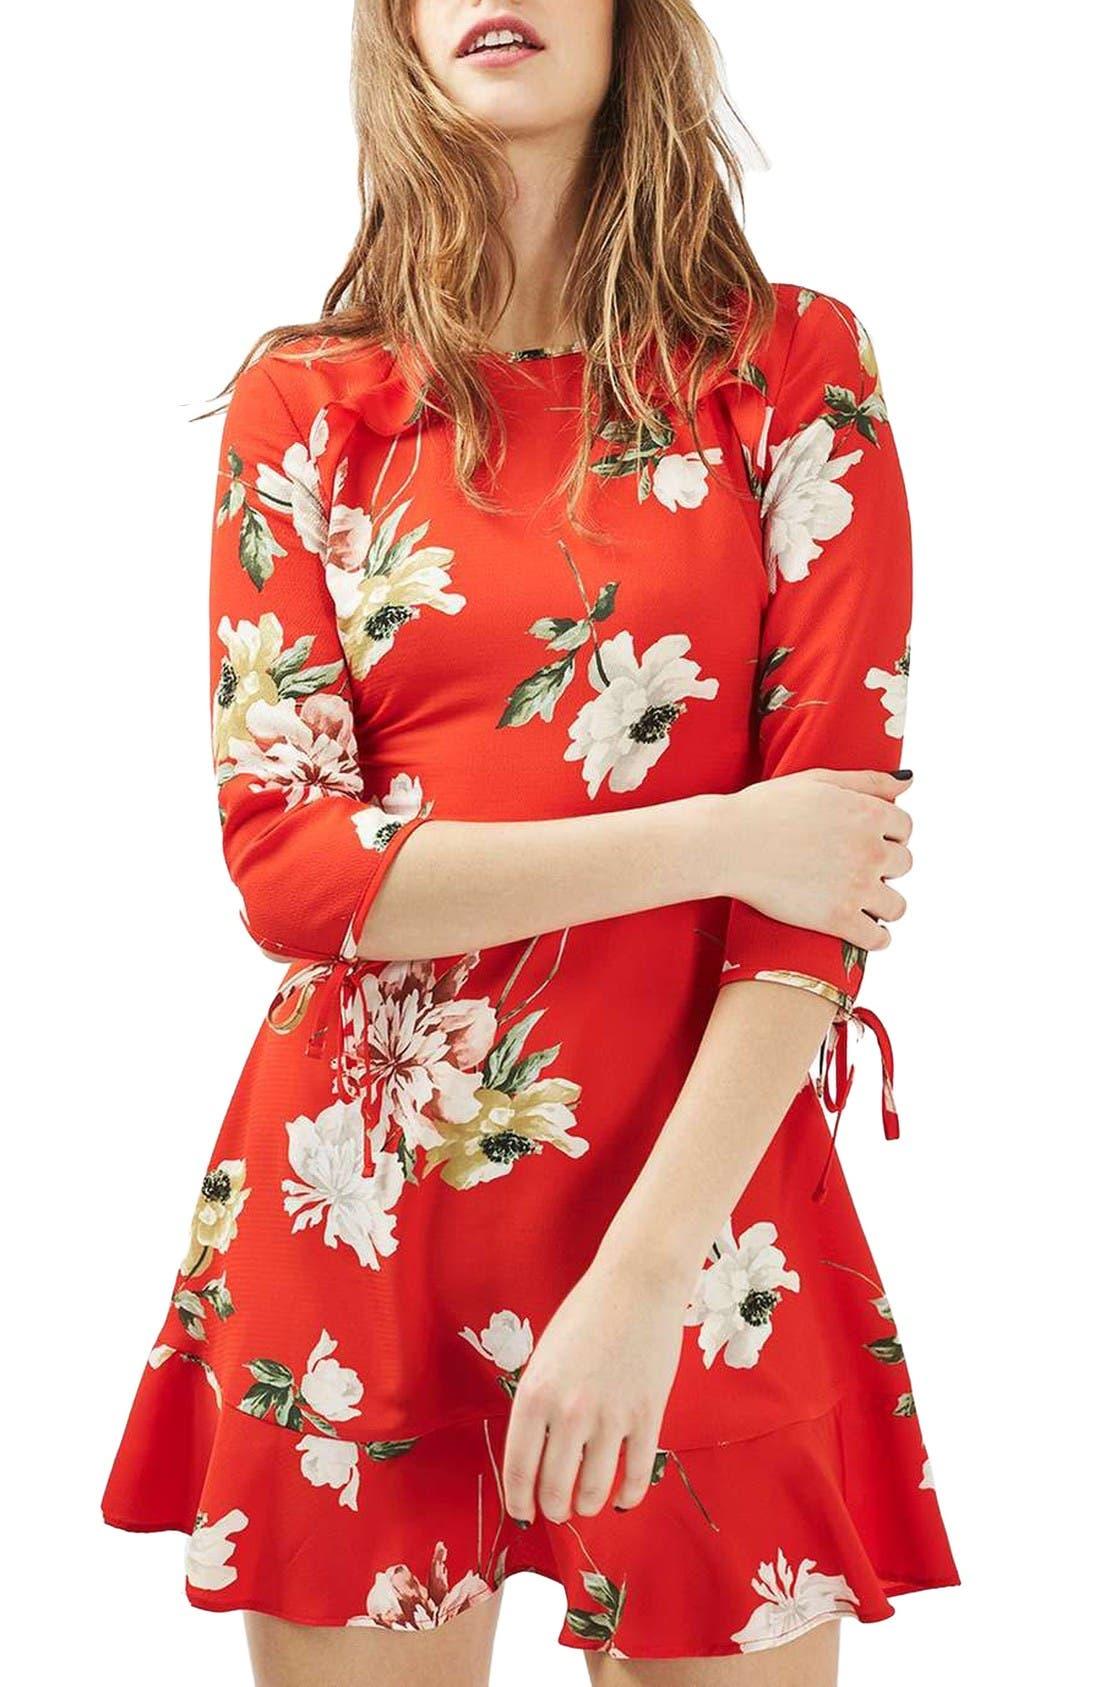 Alternate Image 1 Selected - Topshop Ruffle Floral Tea Dress (Regular & Petite)